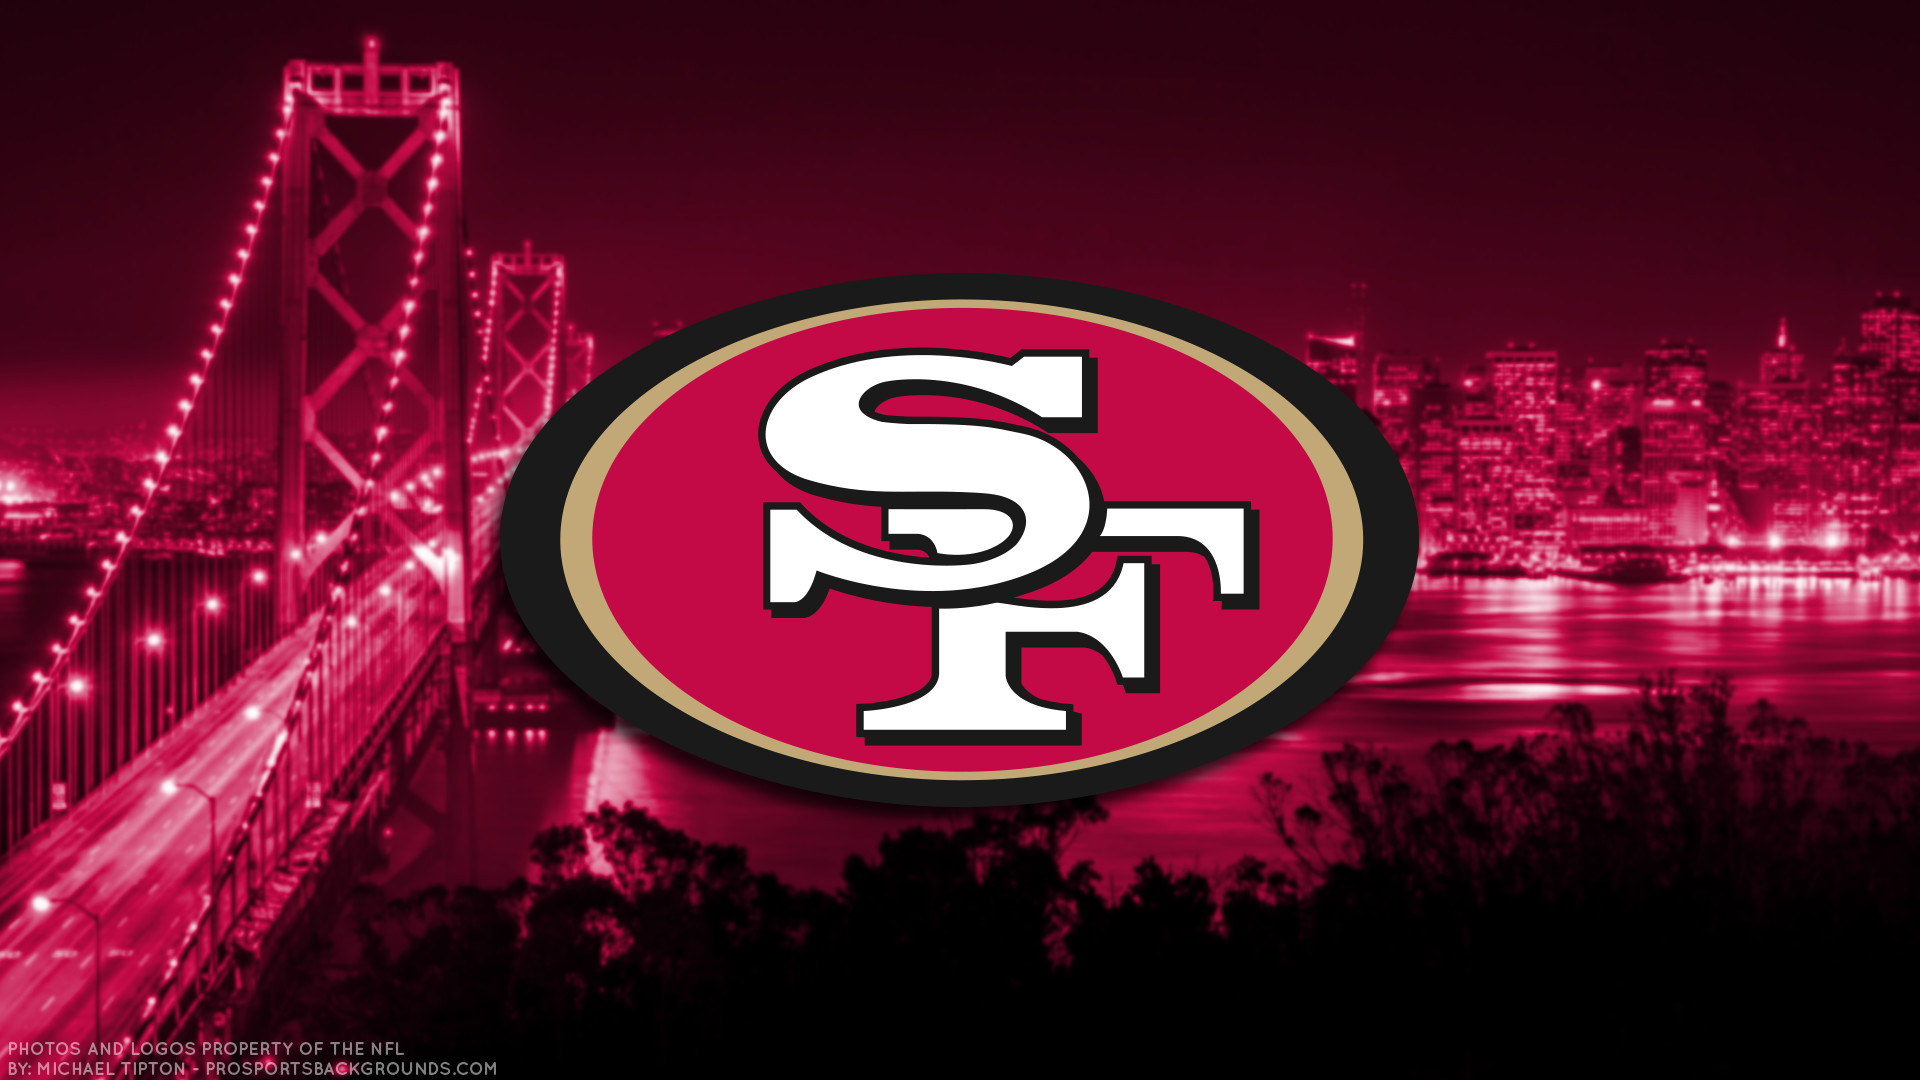 … San Francisco 49ers 2017 football logo wallpaper pc desktop computer